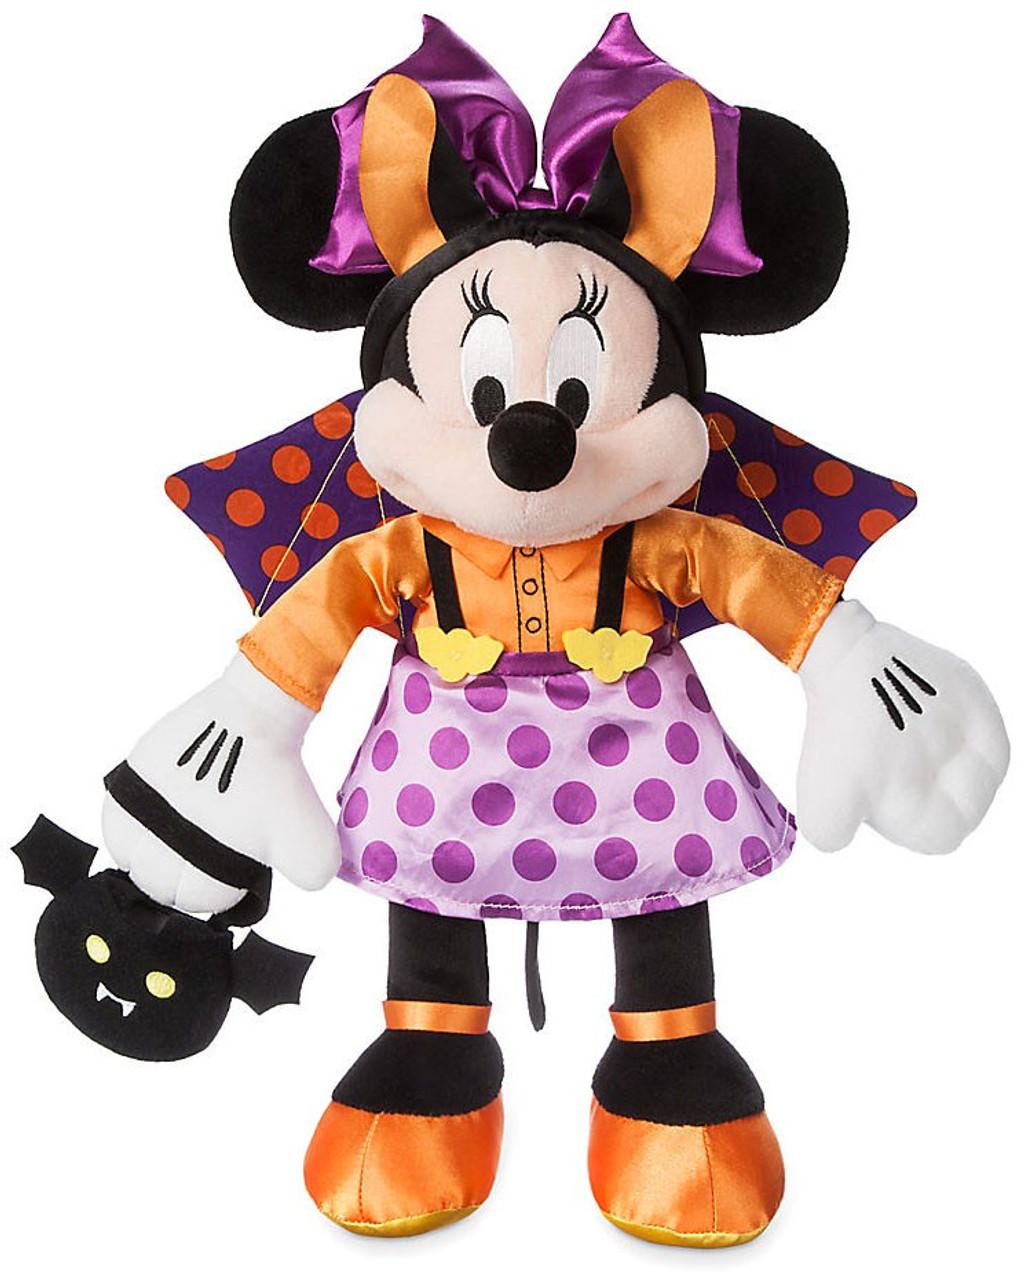 Disney Mickey Mouse Halloween Minnie Mouse 15 Plush Bat - ToyWiz